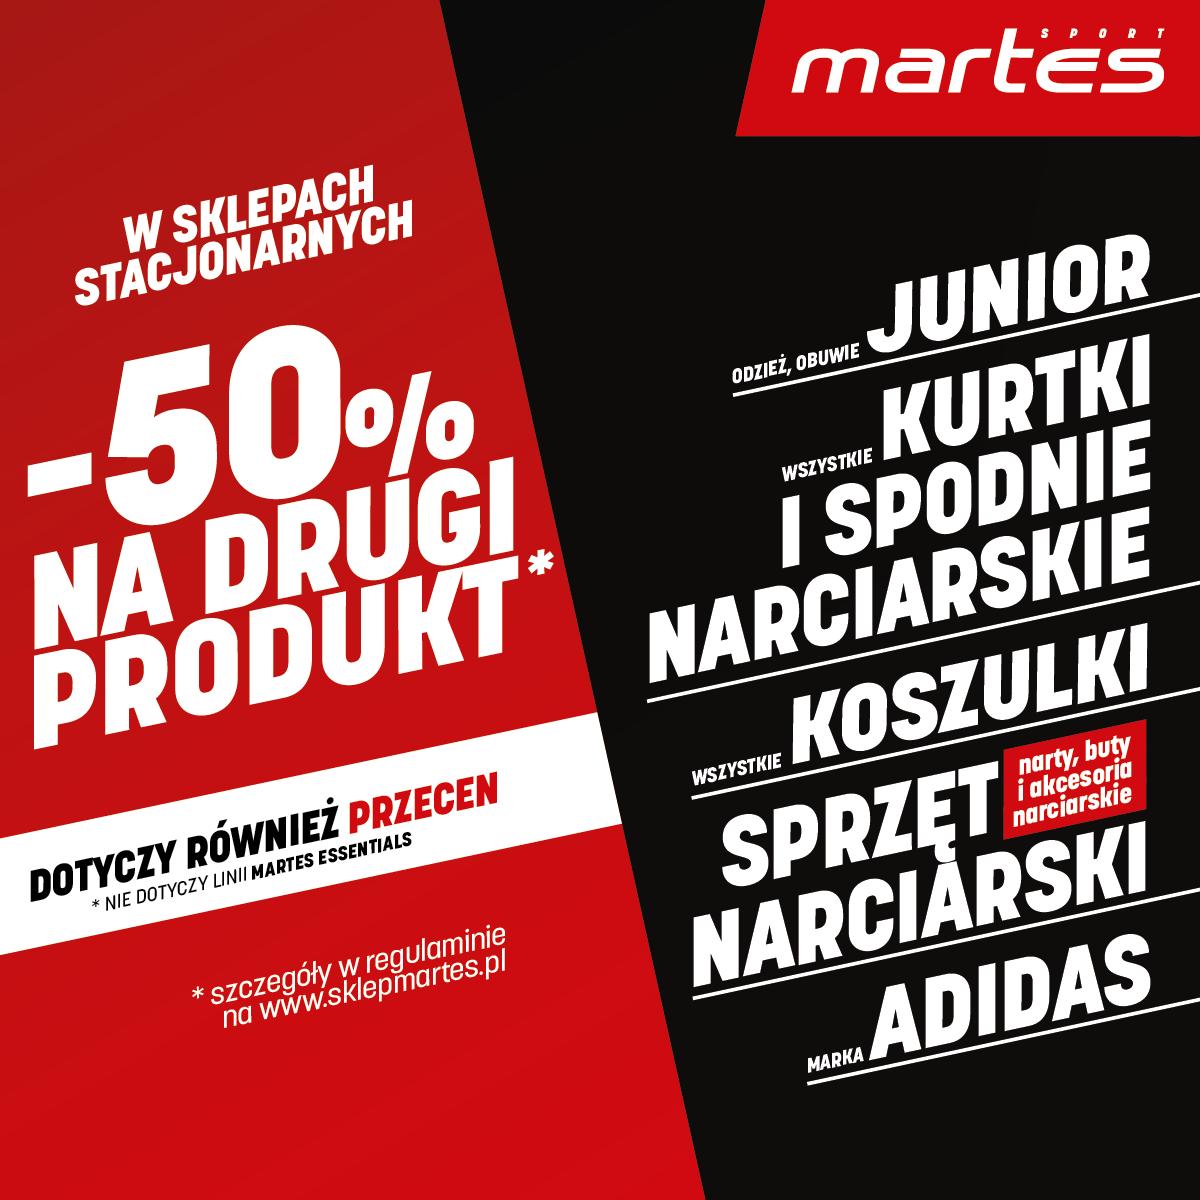 Sklep Martes Sport w Tkalni